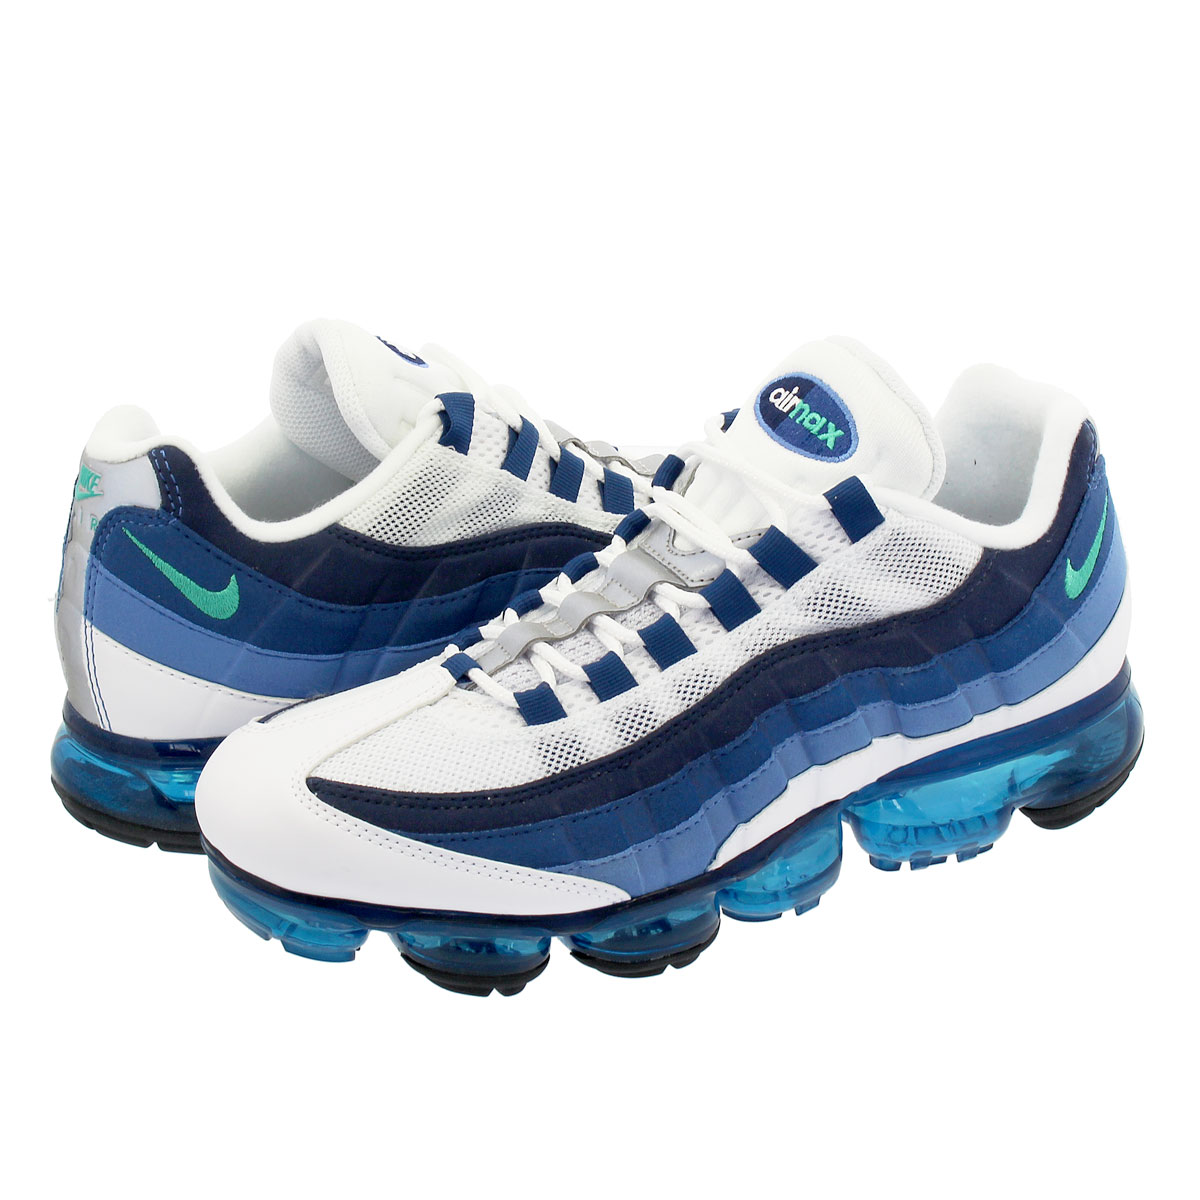 NIKE AIR VAPORMAX 95 ナイキ エア ヴェイパーマックス 95 WHITE/NEW GREEN/FRENCH BLUE/LAKE BLUE aj7292-100